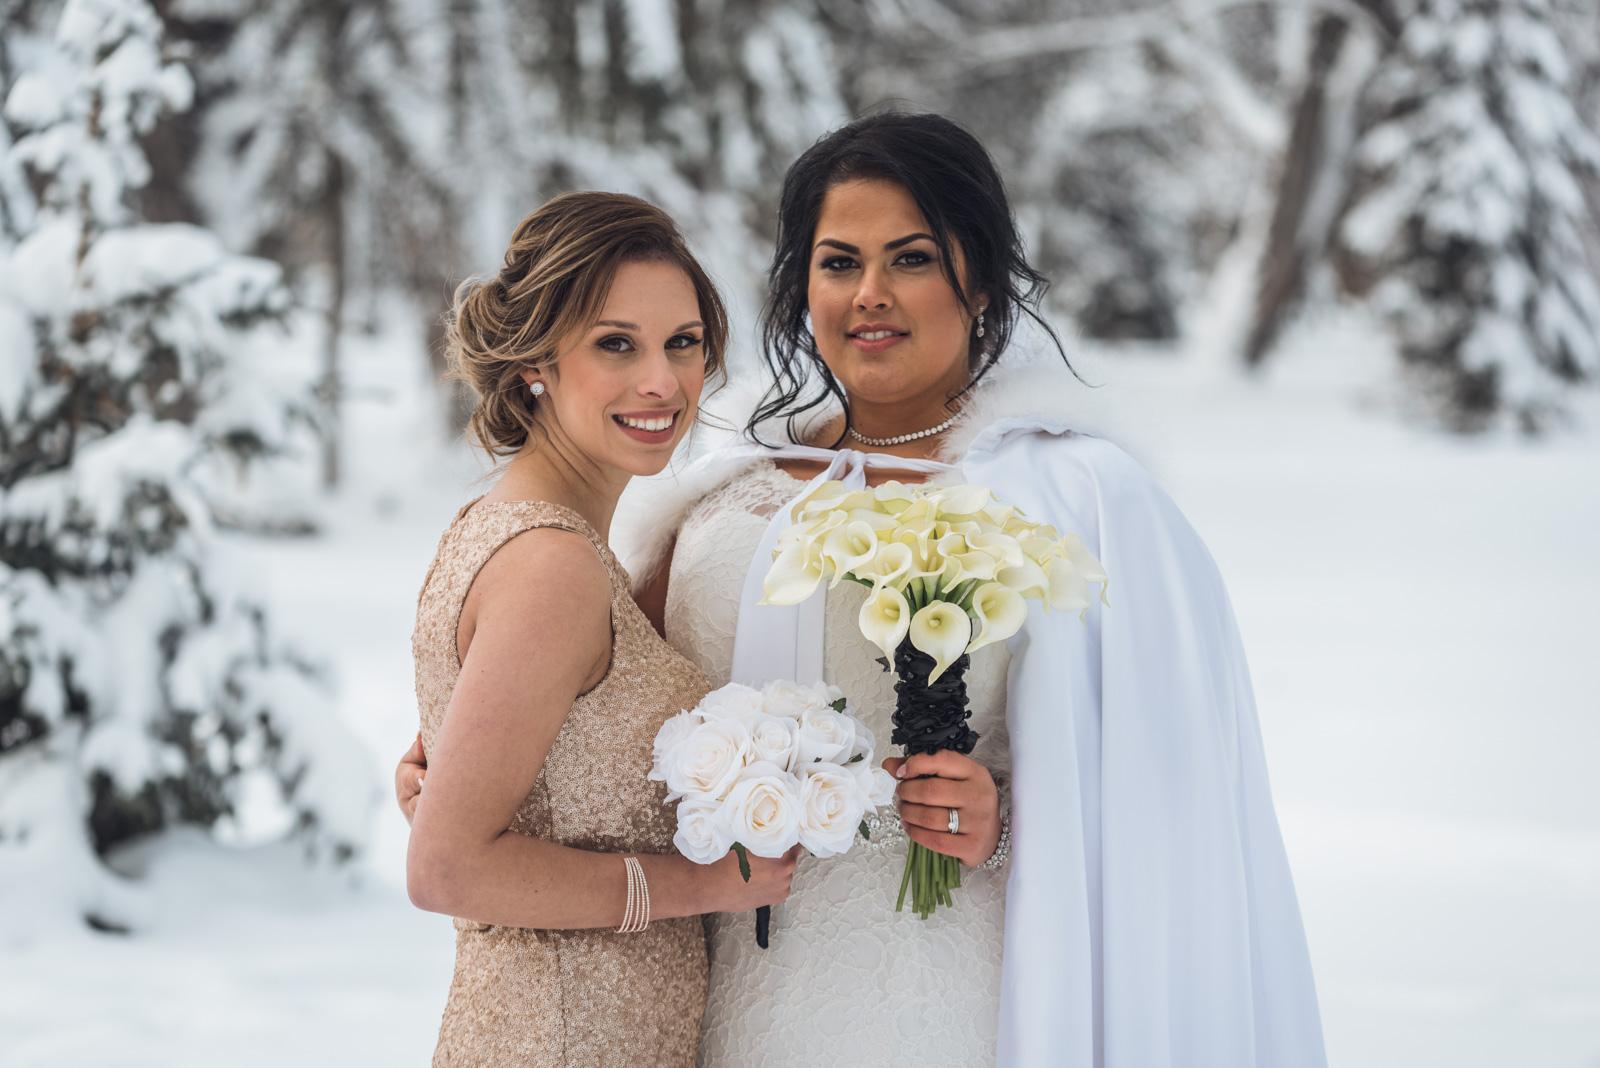 rheana-chris-wedding-blog-166.jpg